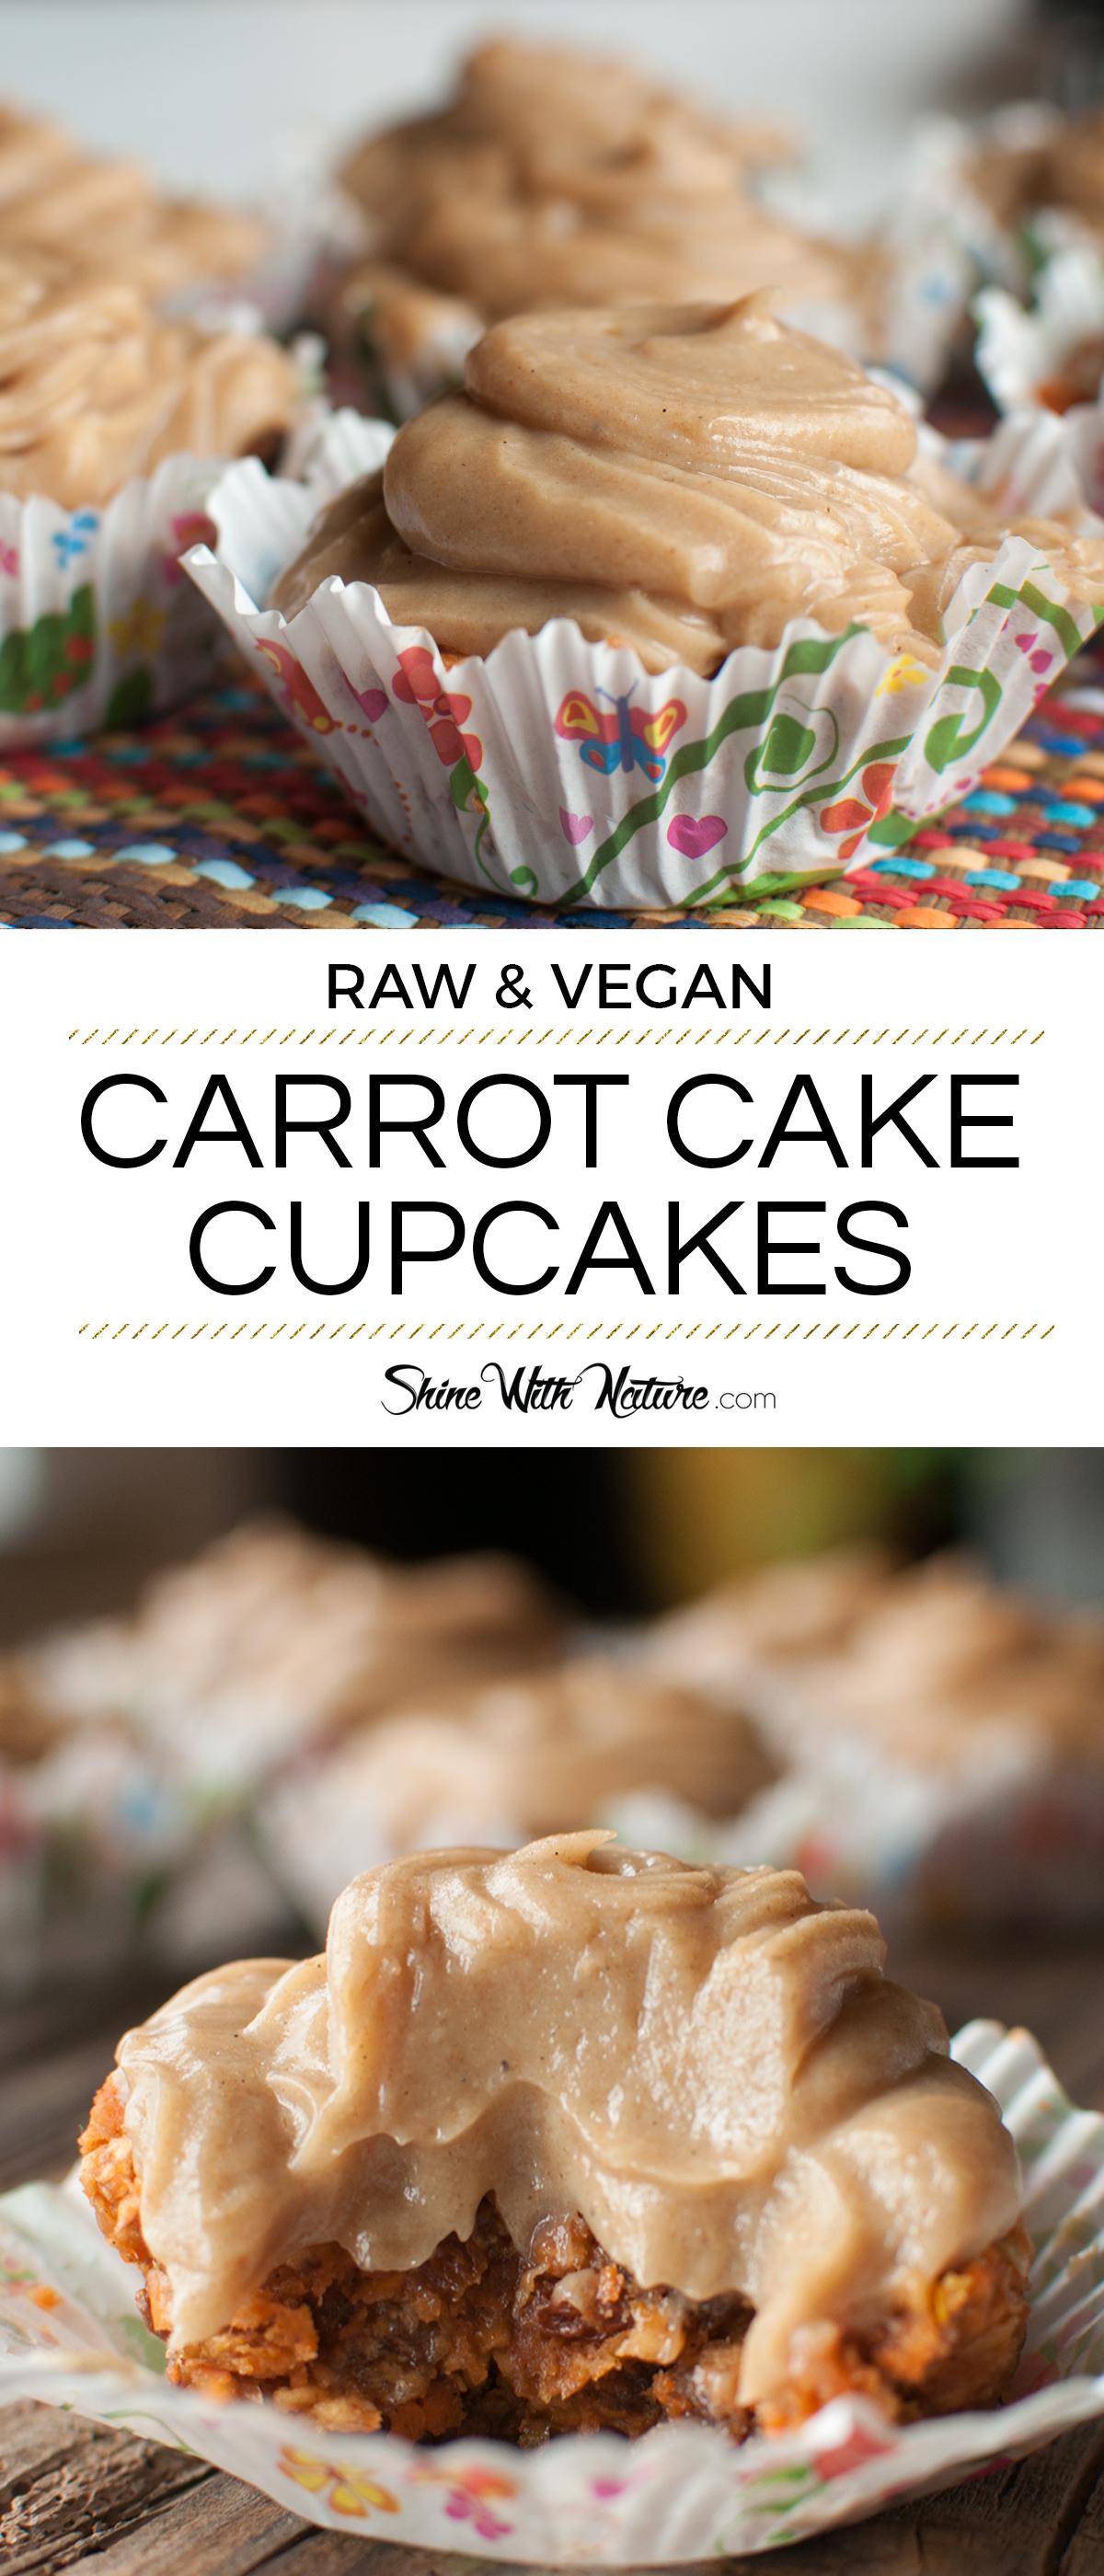 Raw Carrot Cake Cupcakes | ShineWithNature.com